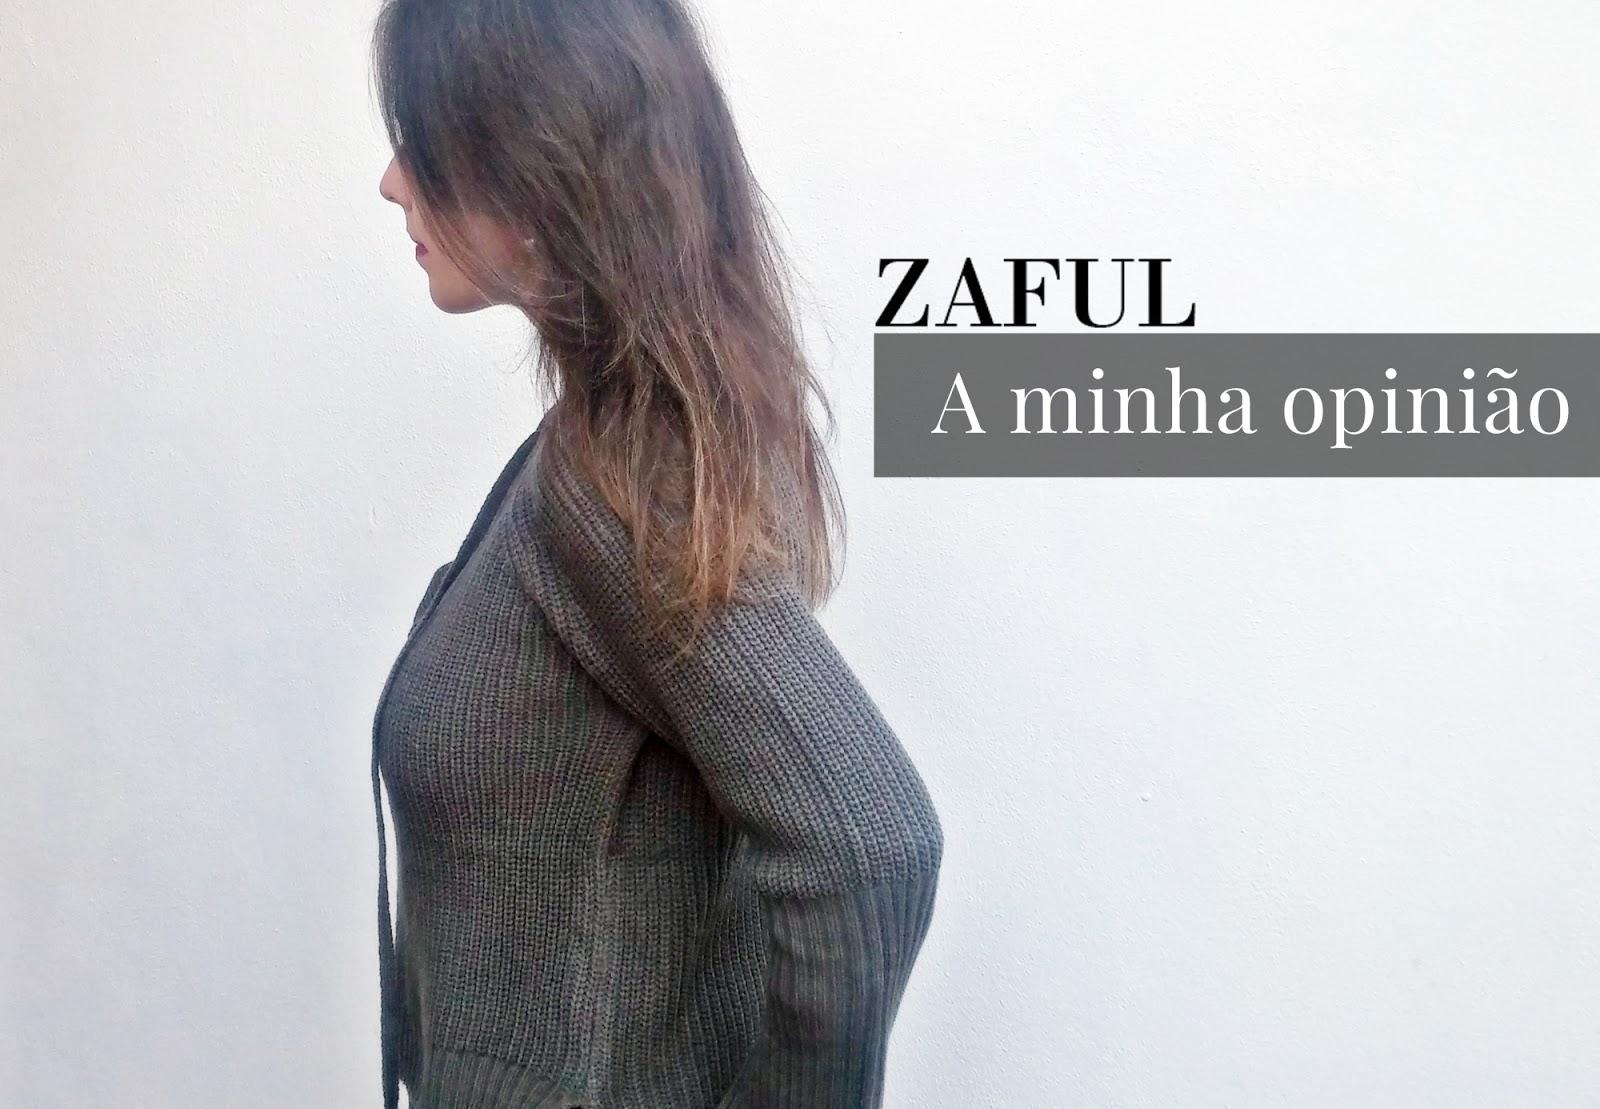 Zaful: a minha opinião